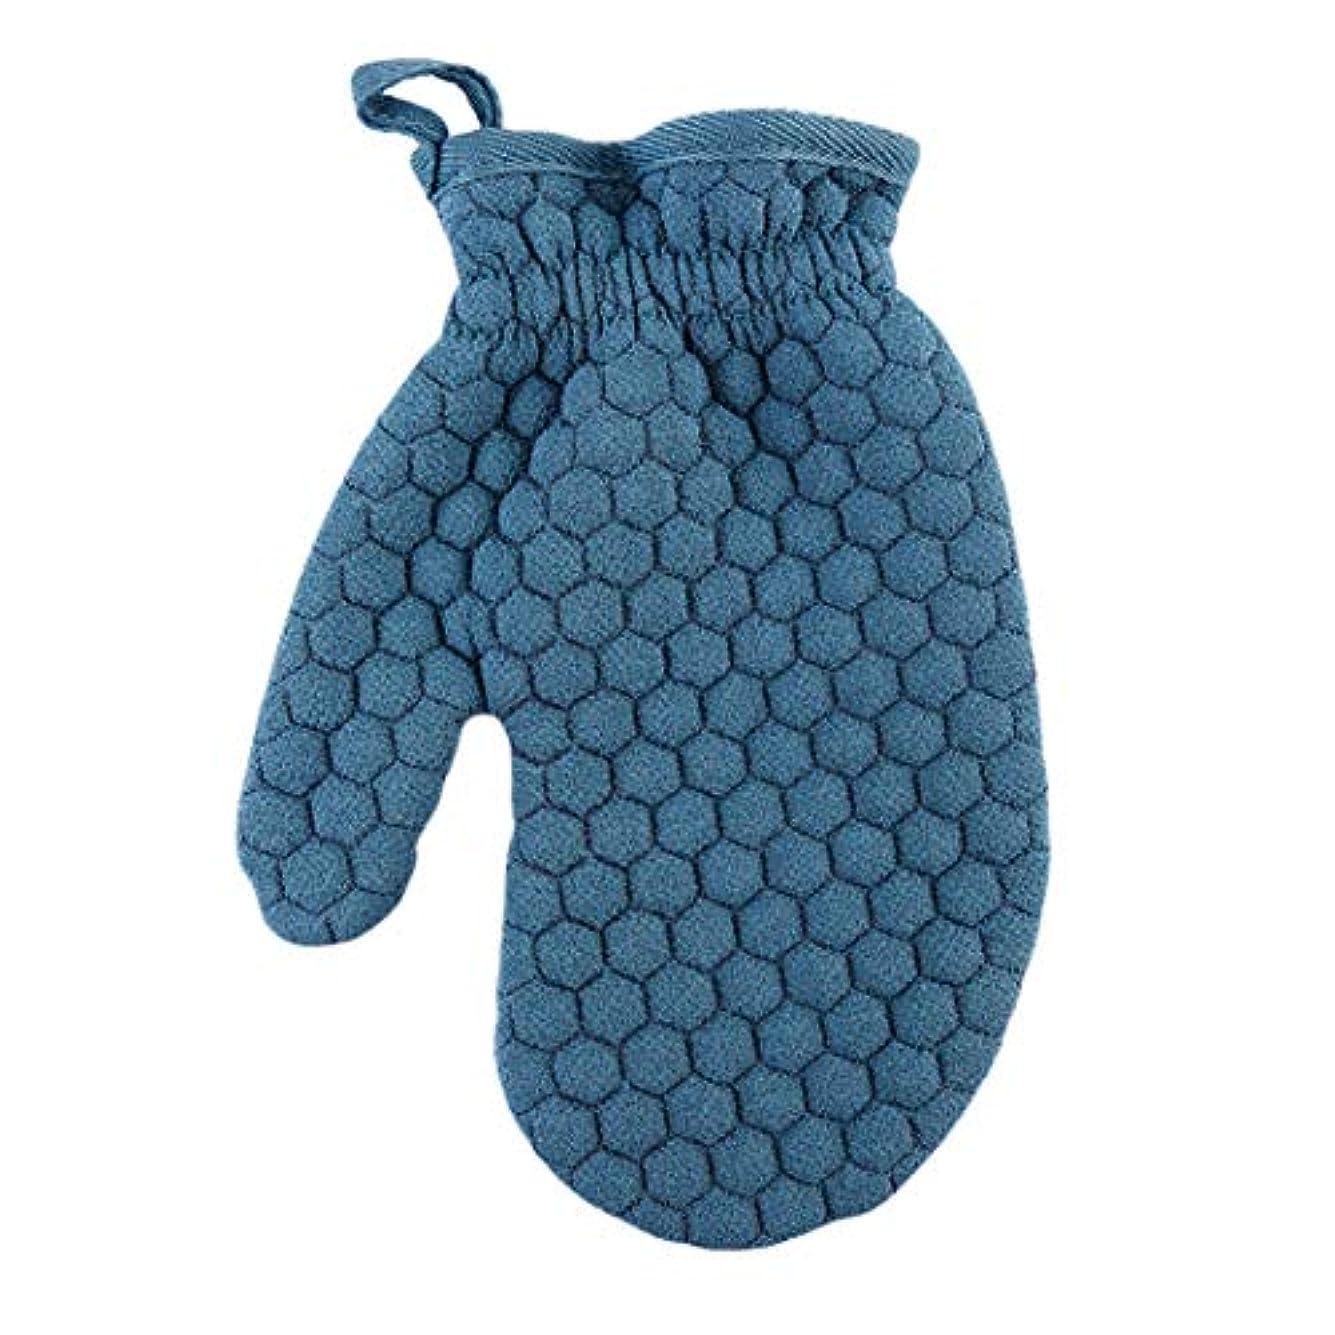 Lehao ボディ手袋 ボディミトン 両面あかすり 垢すり手袋 弾性カフ ボディブラシ 浴用手袋 ボディタオル 男女兼用 入浴用品